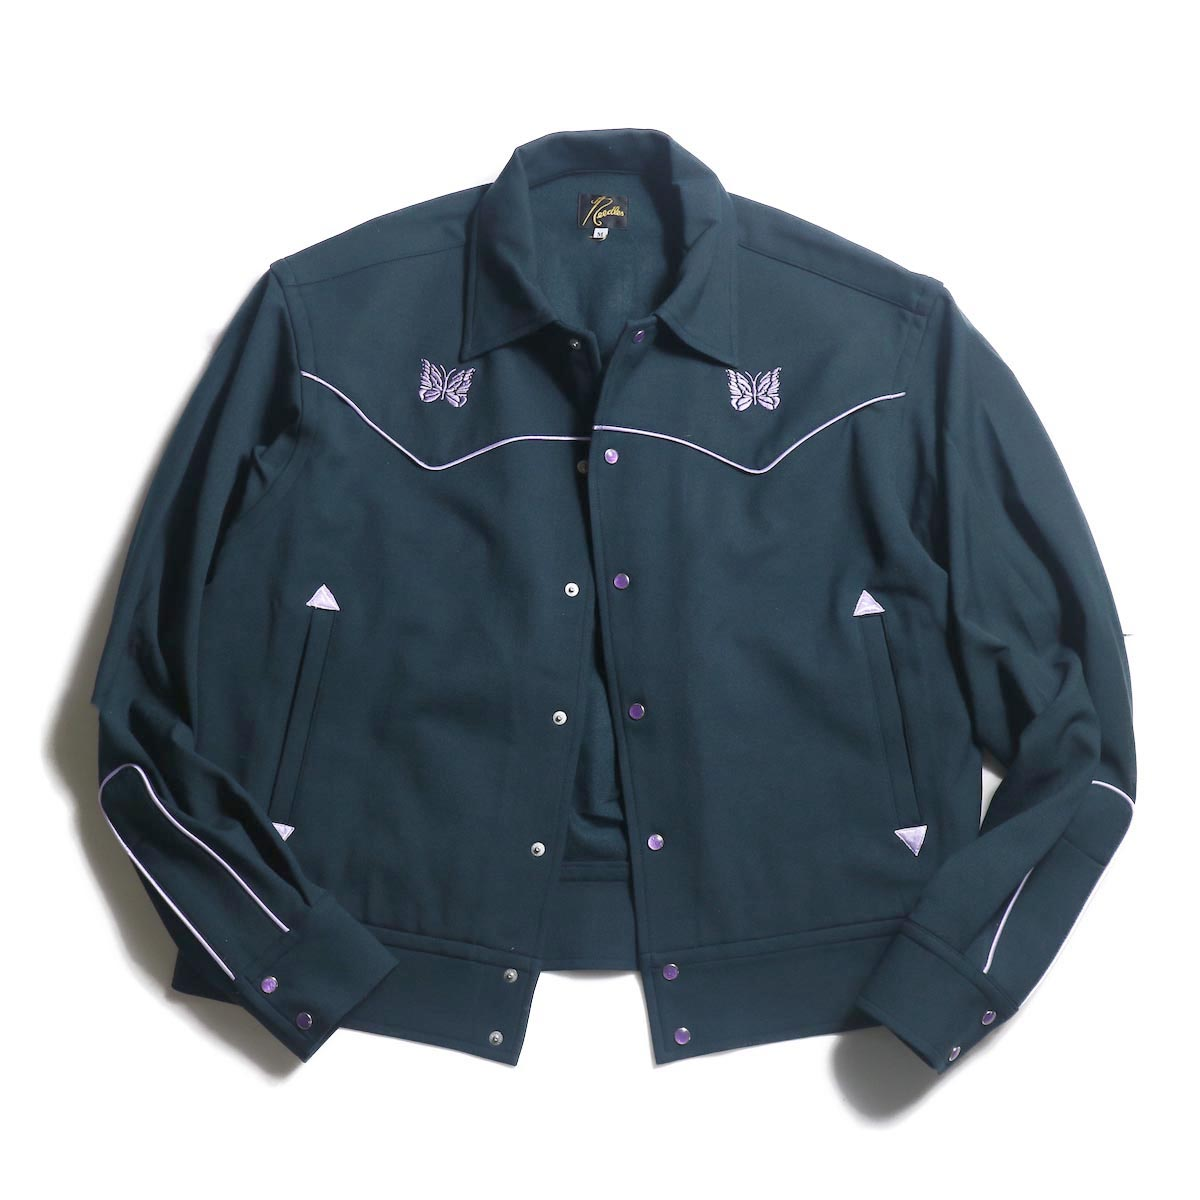 Needles / PIPING COWBOY JAC - PE/R/PU TWILL (Green)